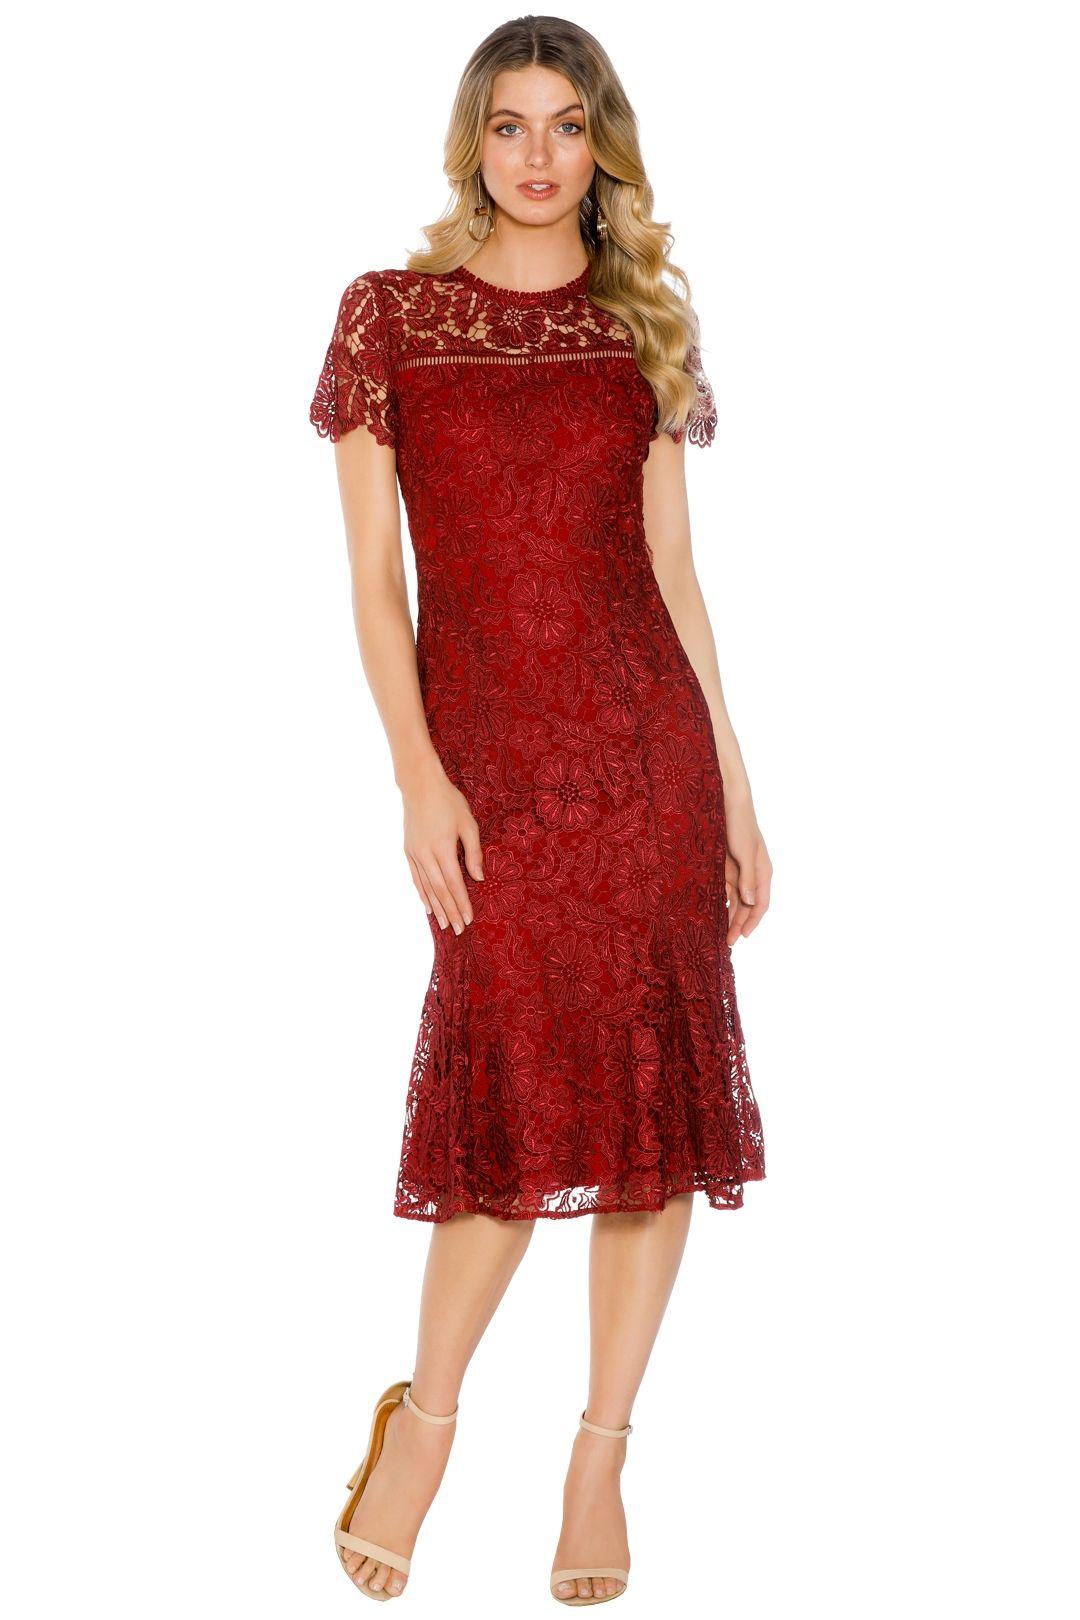 Shoshanna - Park Midi Dress - Red - Front